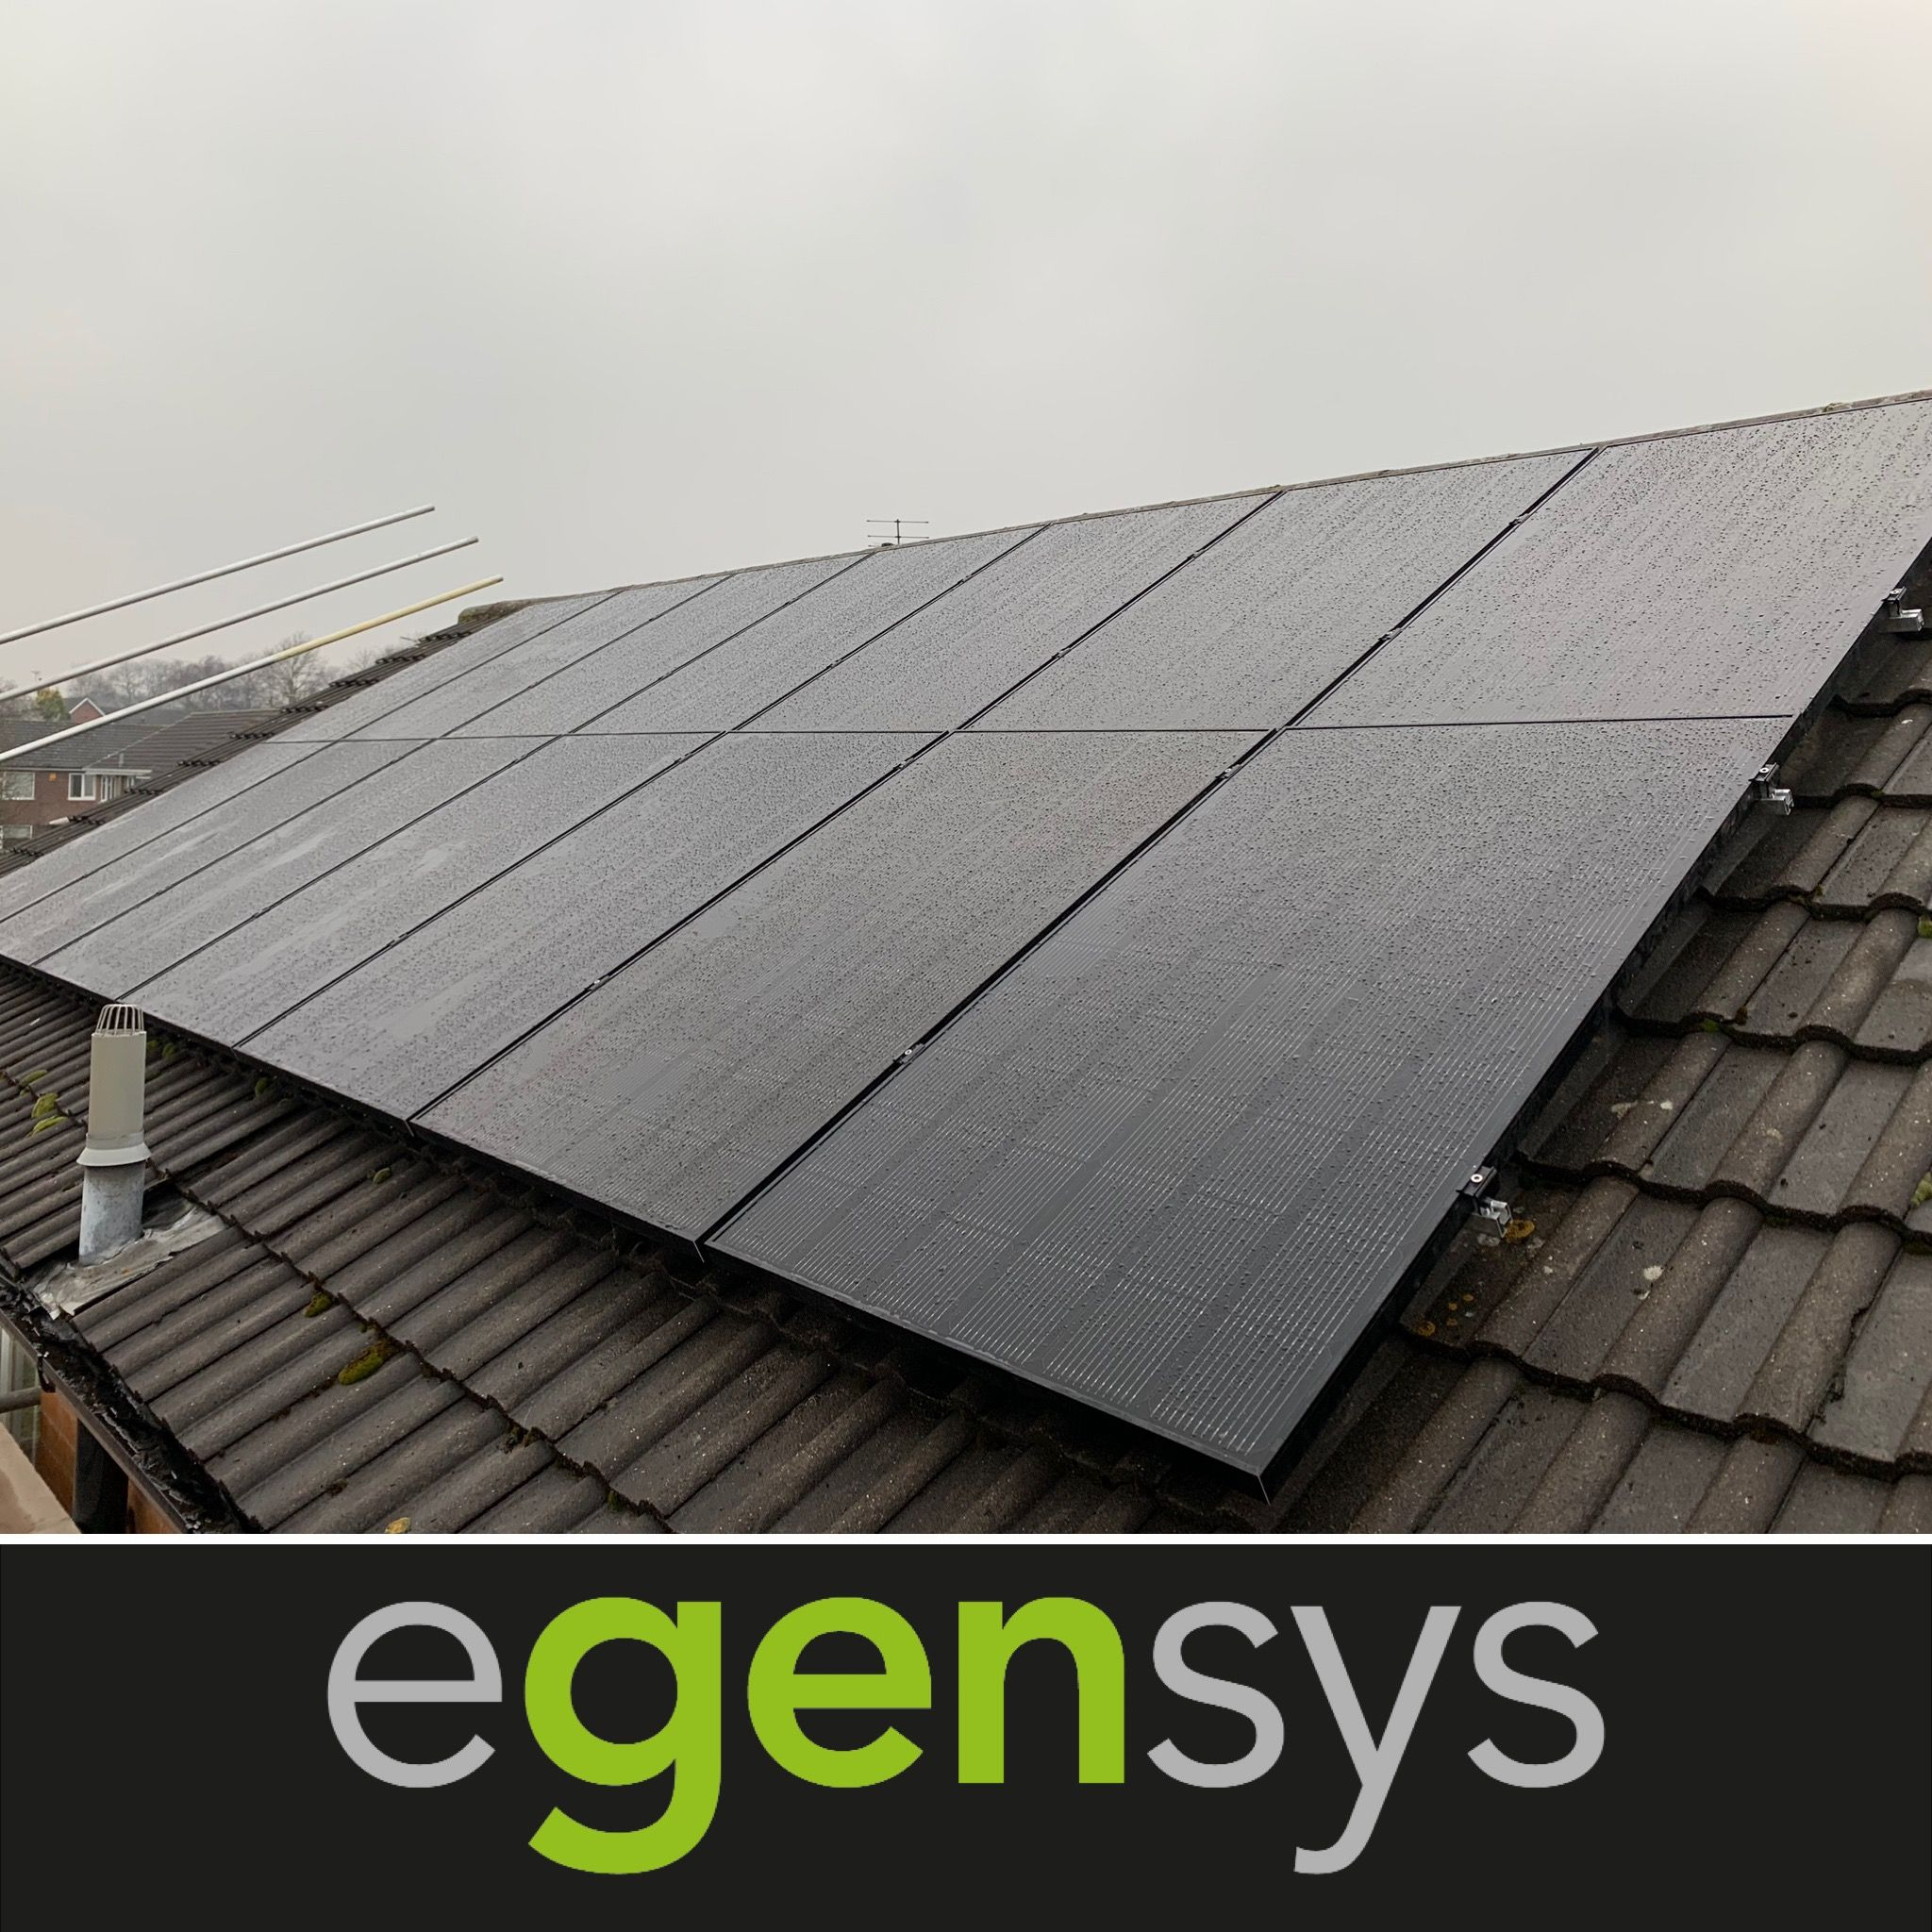 4 5 Kw Solar Pv System Using Lg Neon 320 Watt All Black Solar Modules Installed In Ravenshead Nottinghamshire The Lg Solar Pv Systems Solar Pv Solar Module